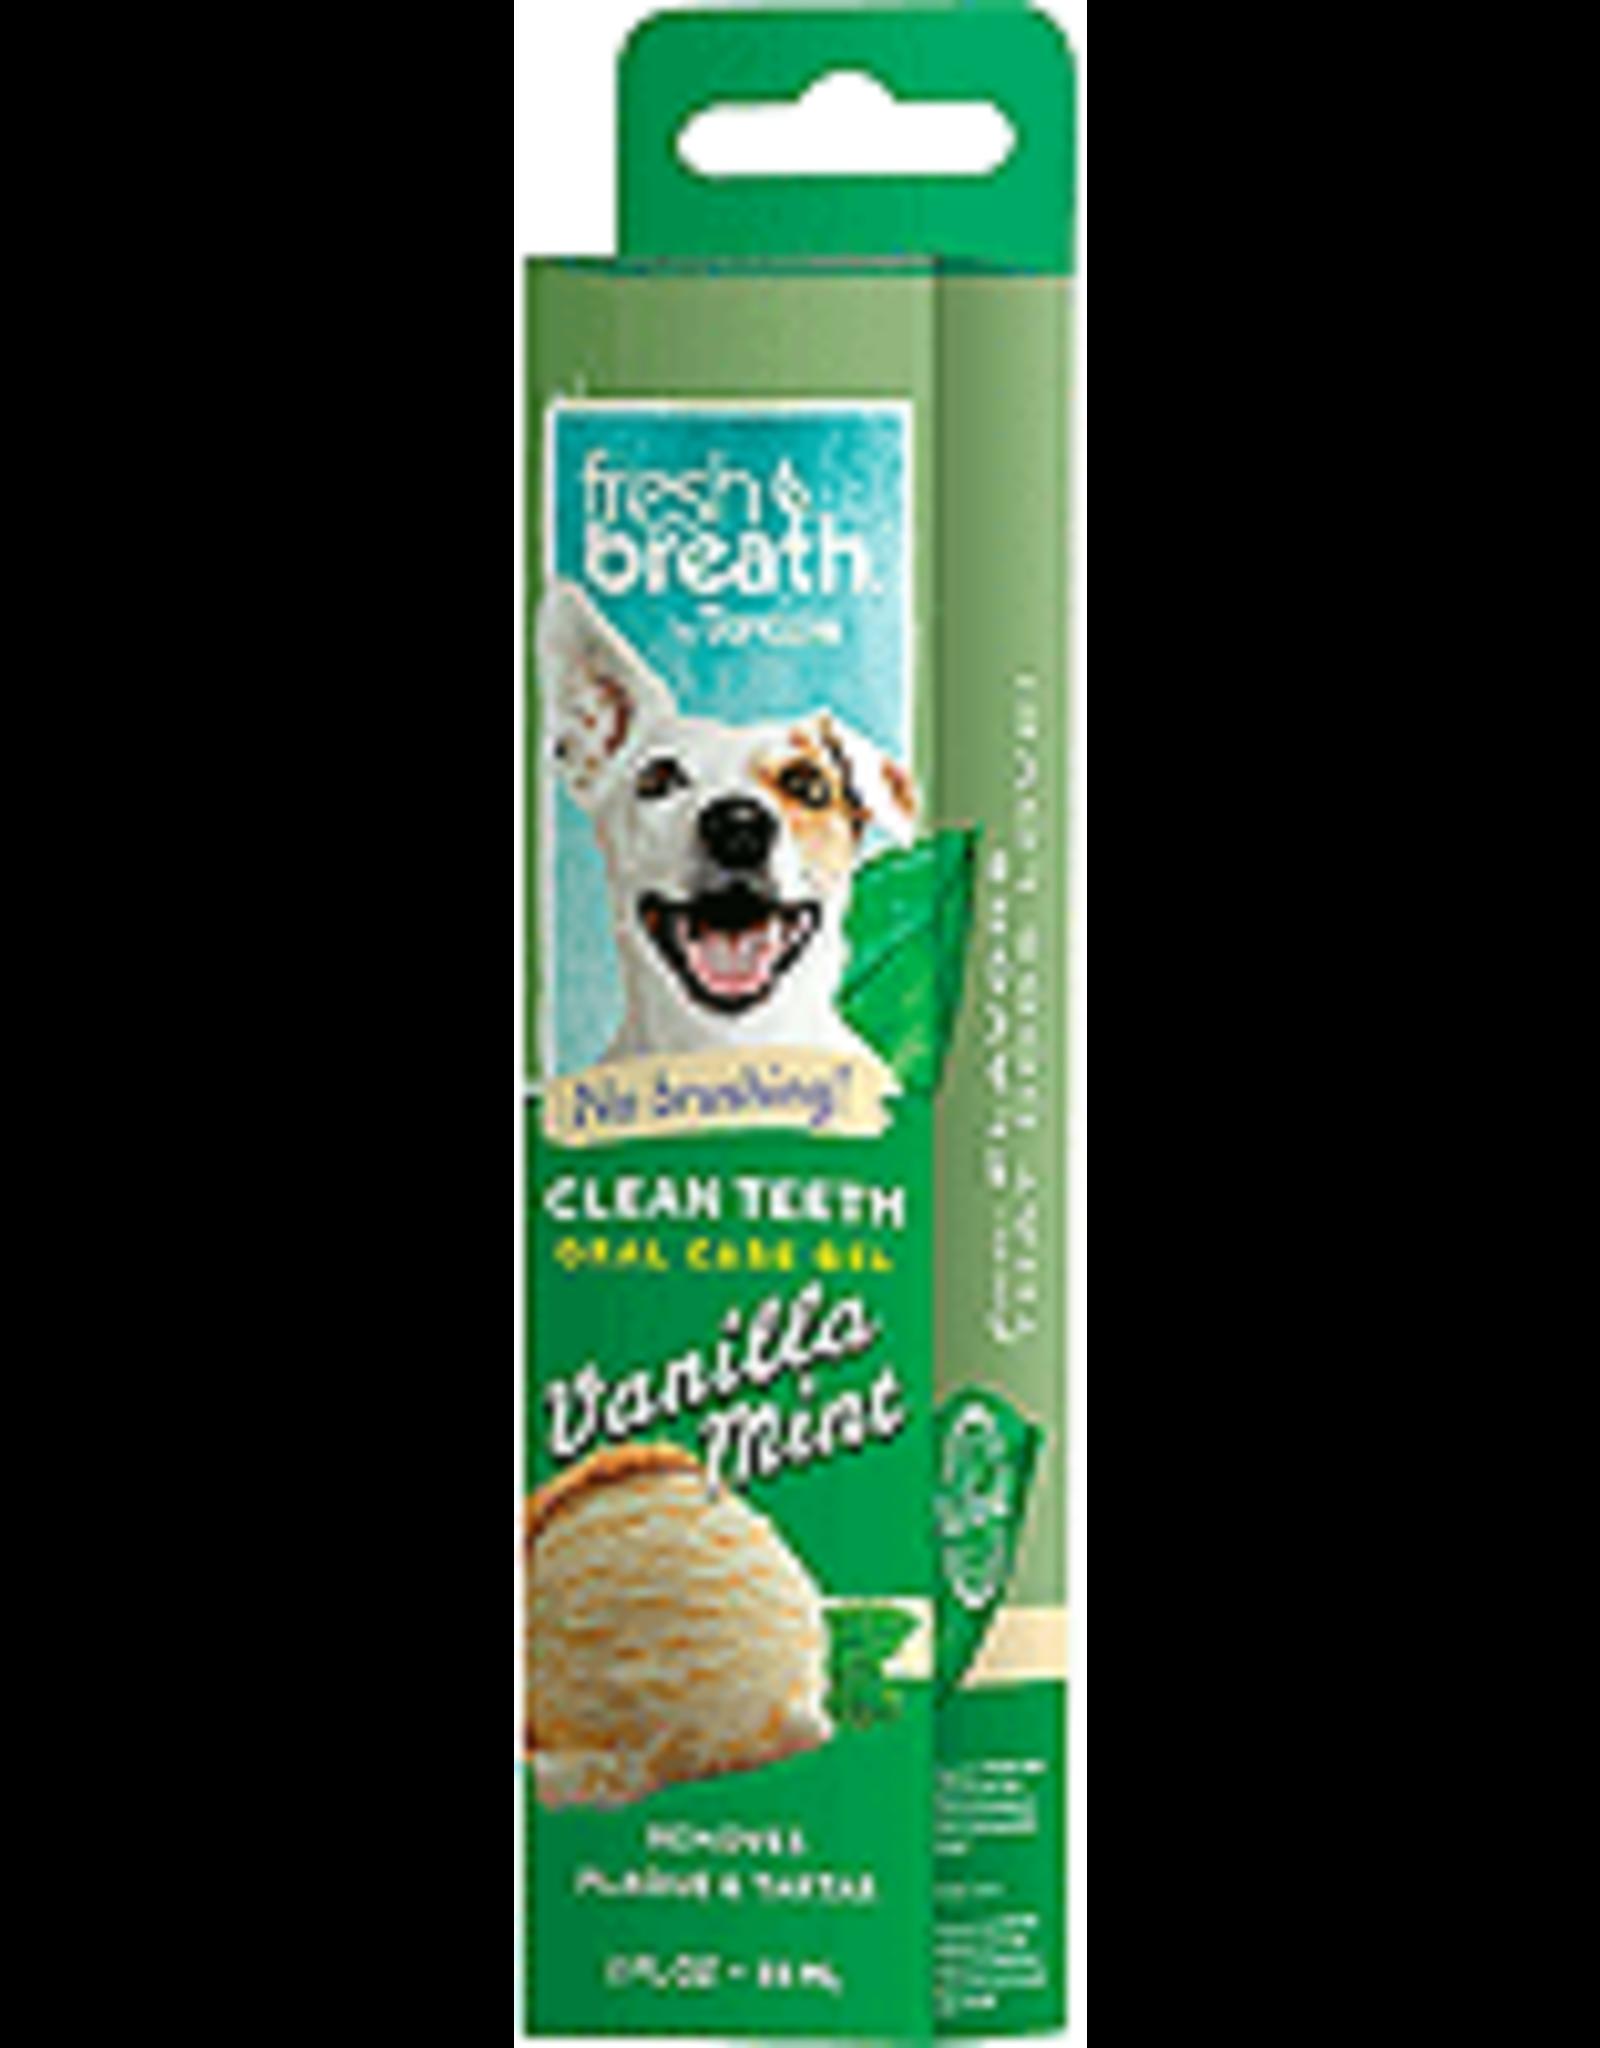 TropiClean FRESH BREATH Gel Vanilla Mint 2oz